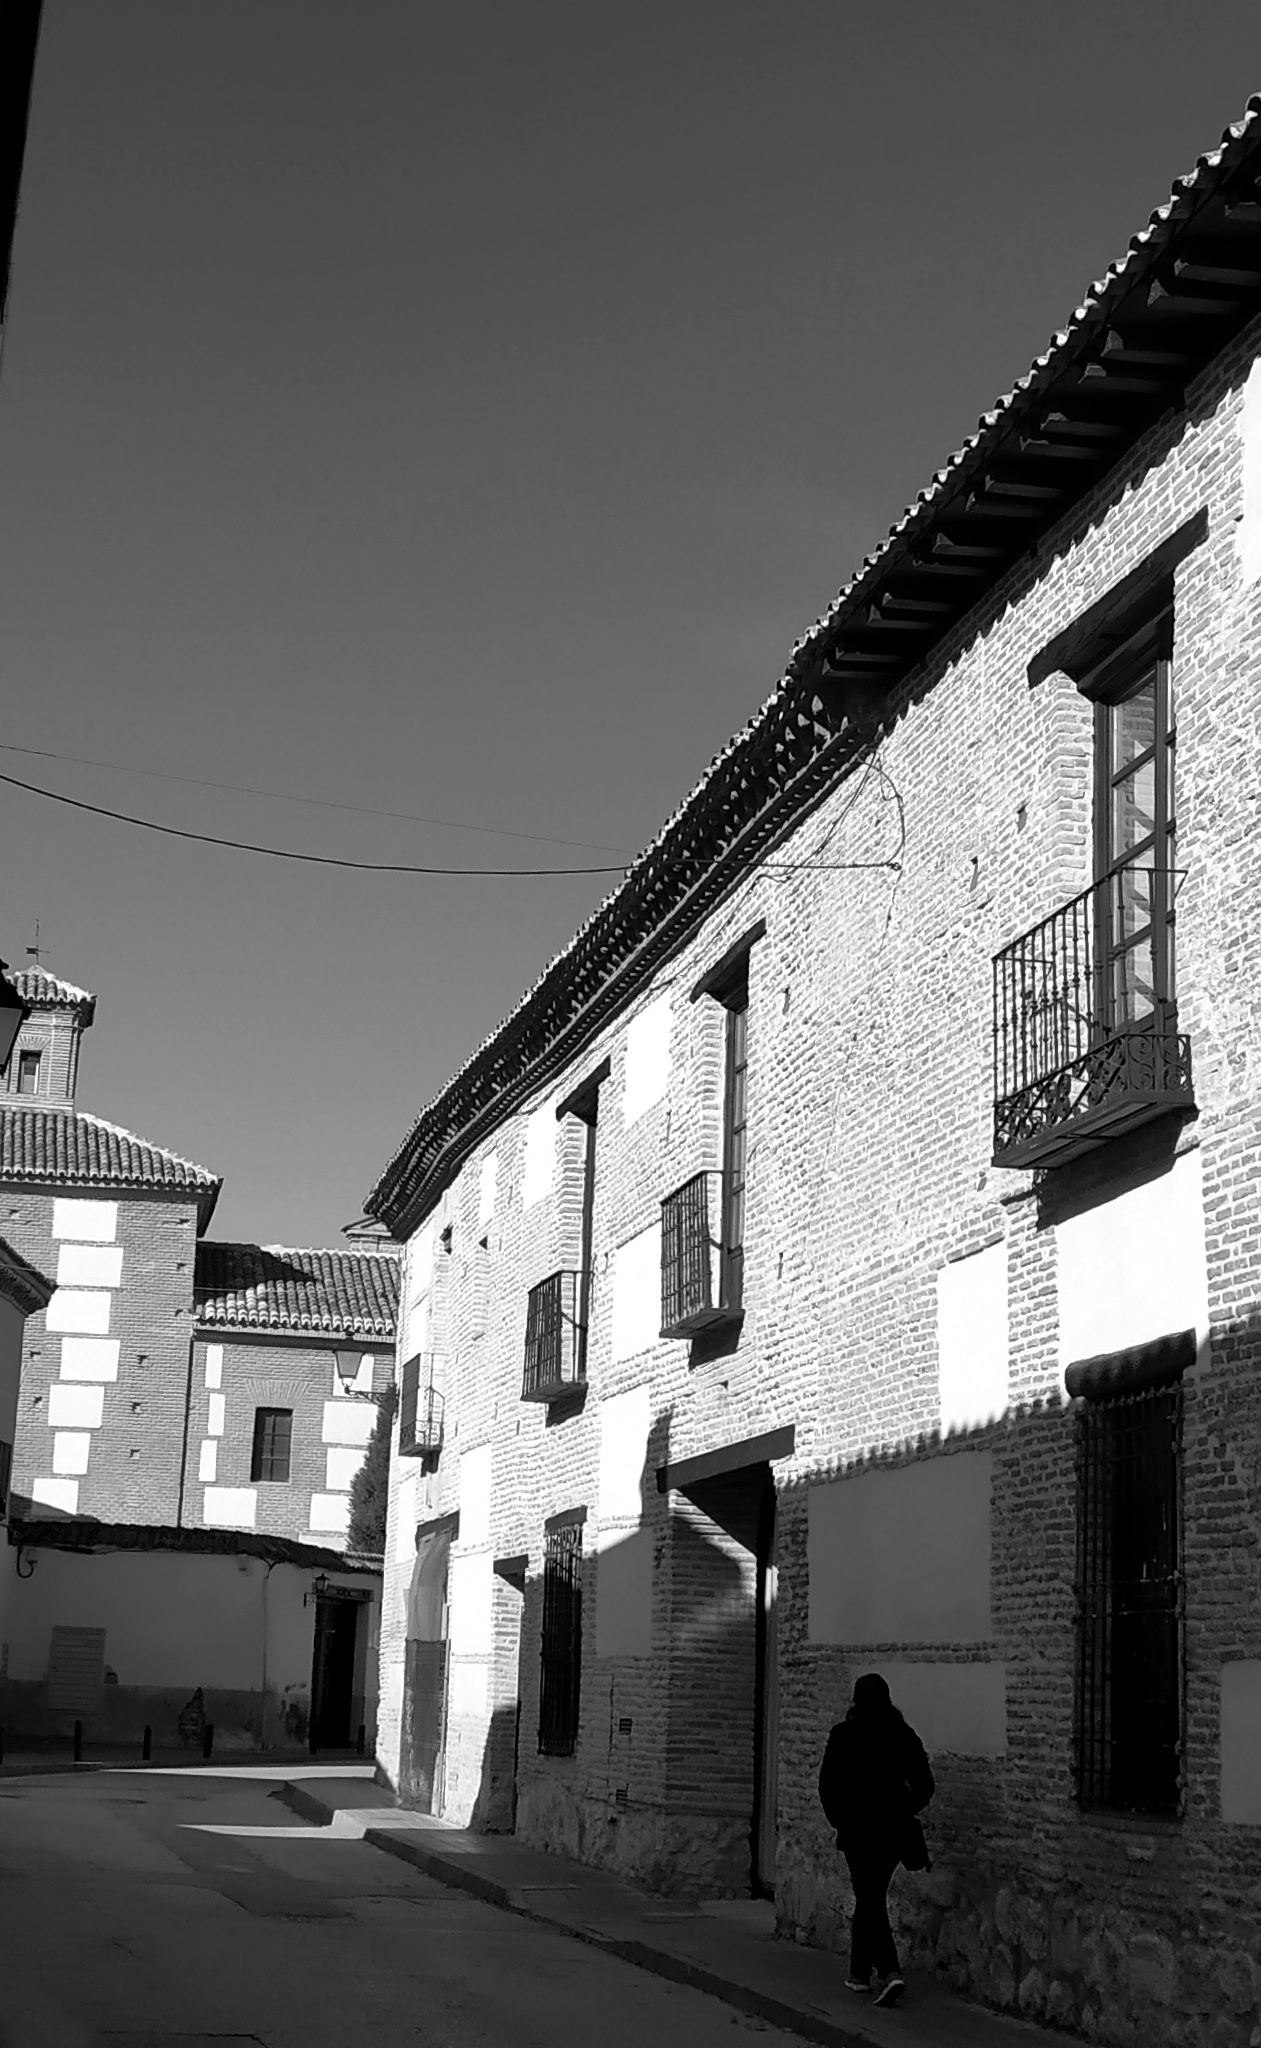 Calle de la Tercia, Centro Histórico de Alcalá de Henares